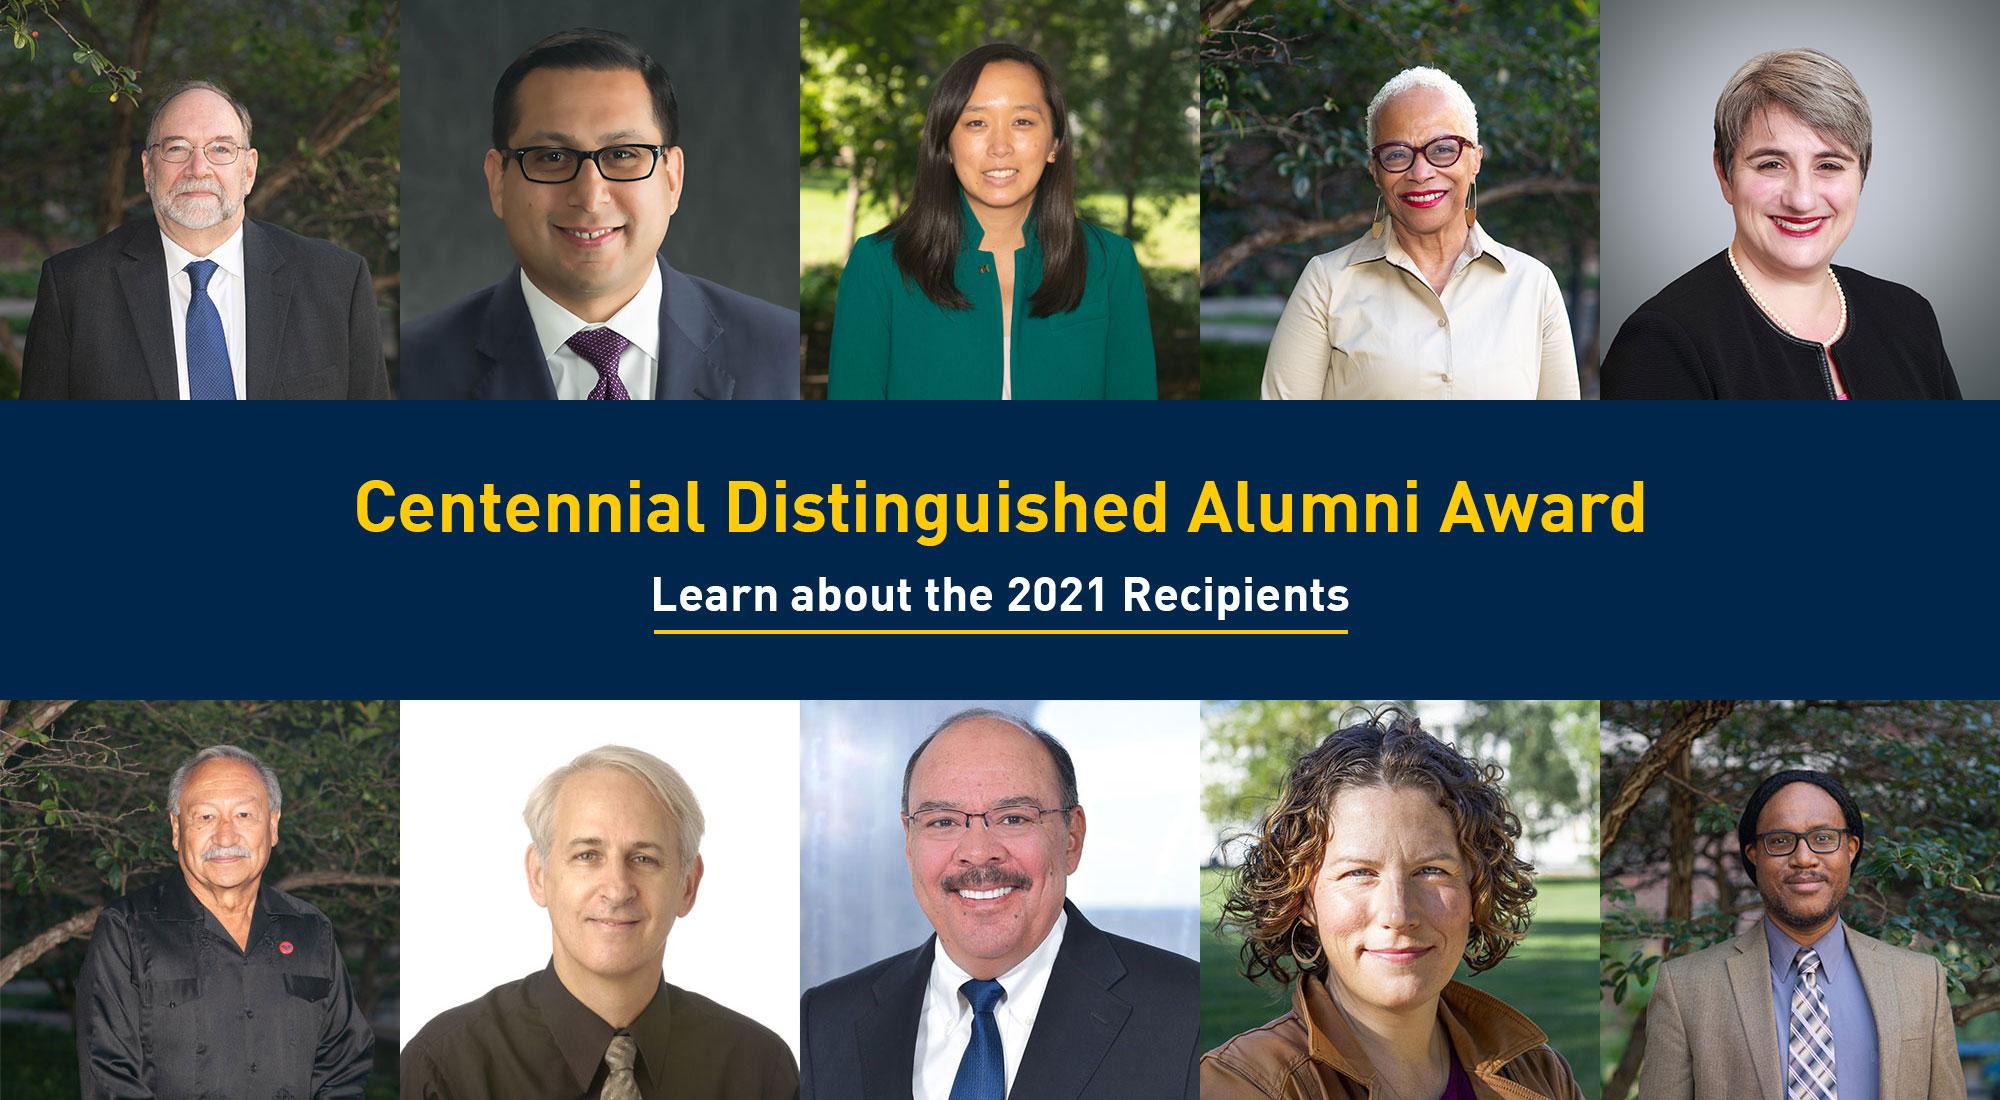 Centennial Distinguished Alumni Award Recipients